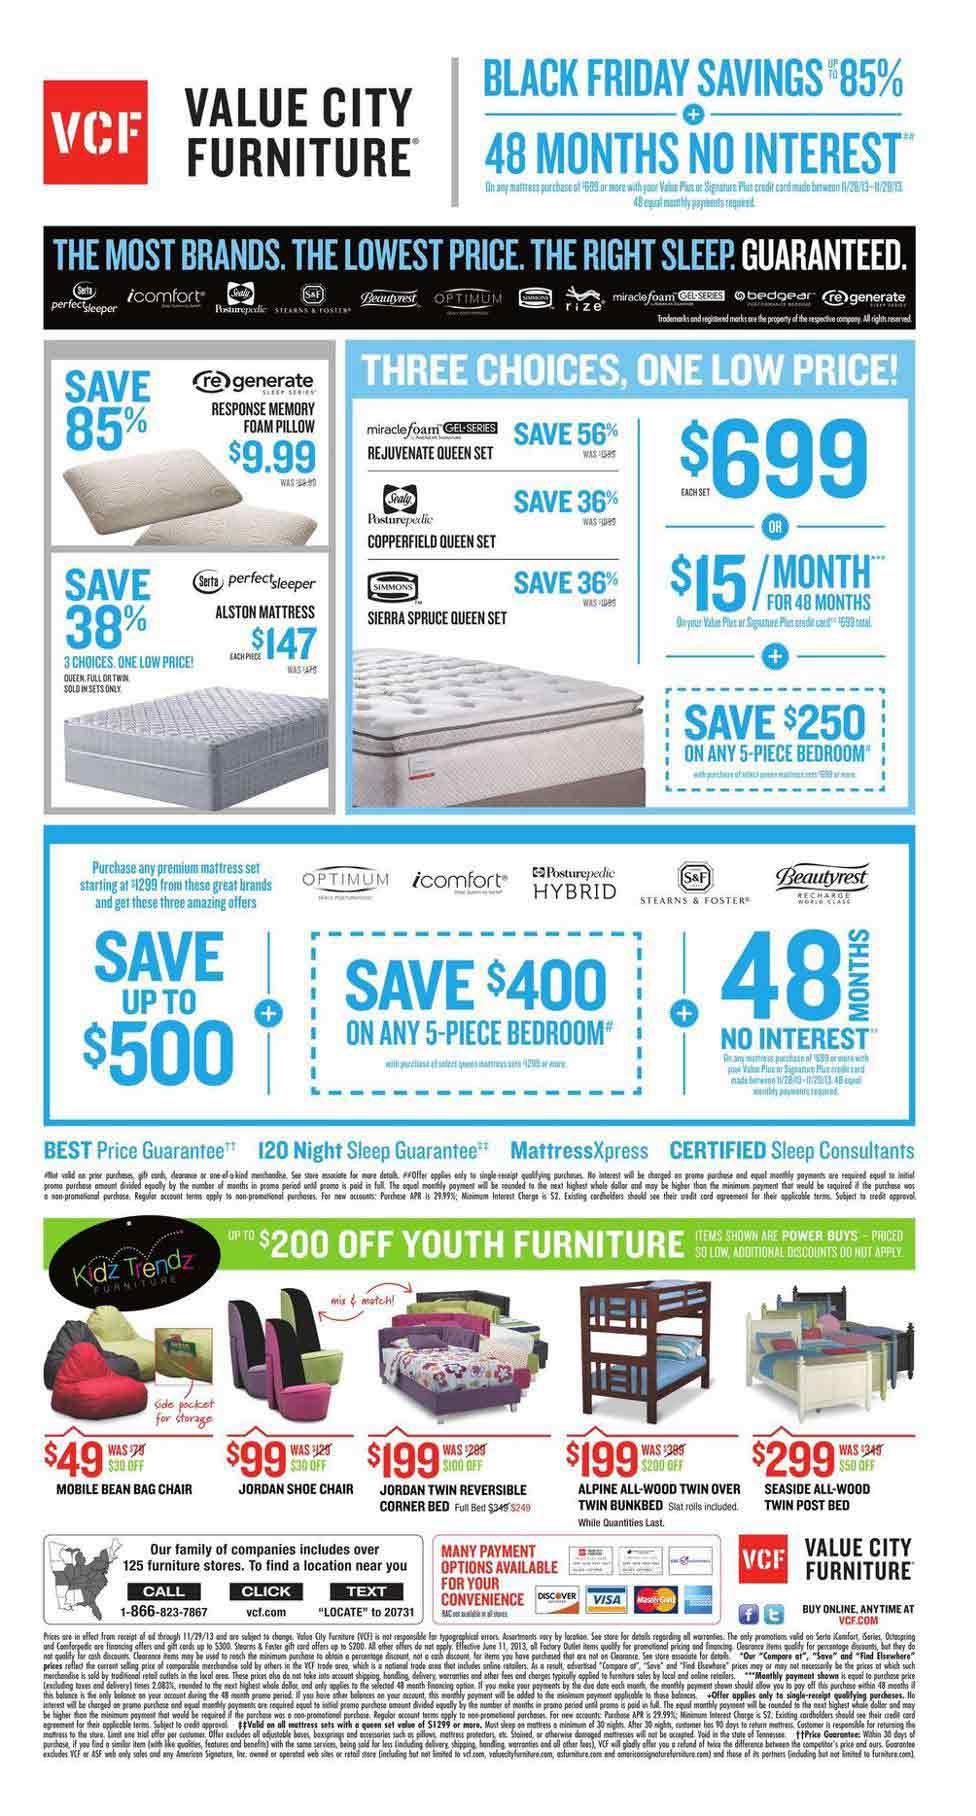 Value-City-Furniture-Black-Friday-08